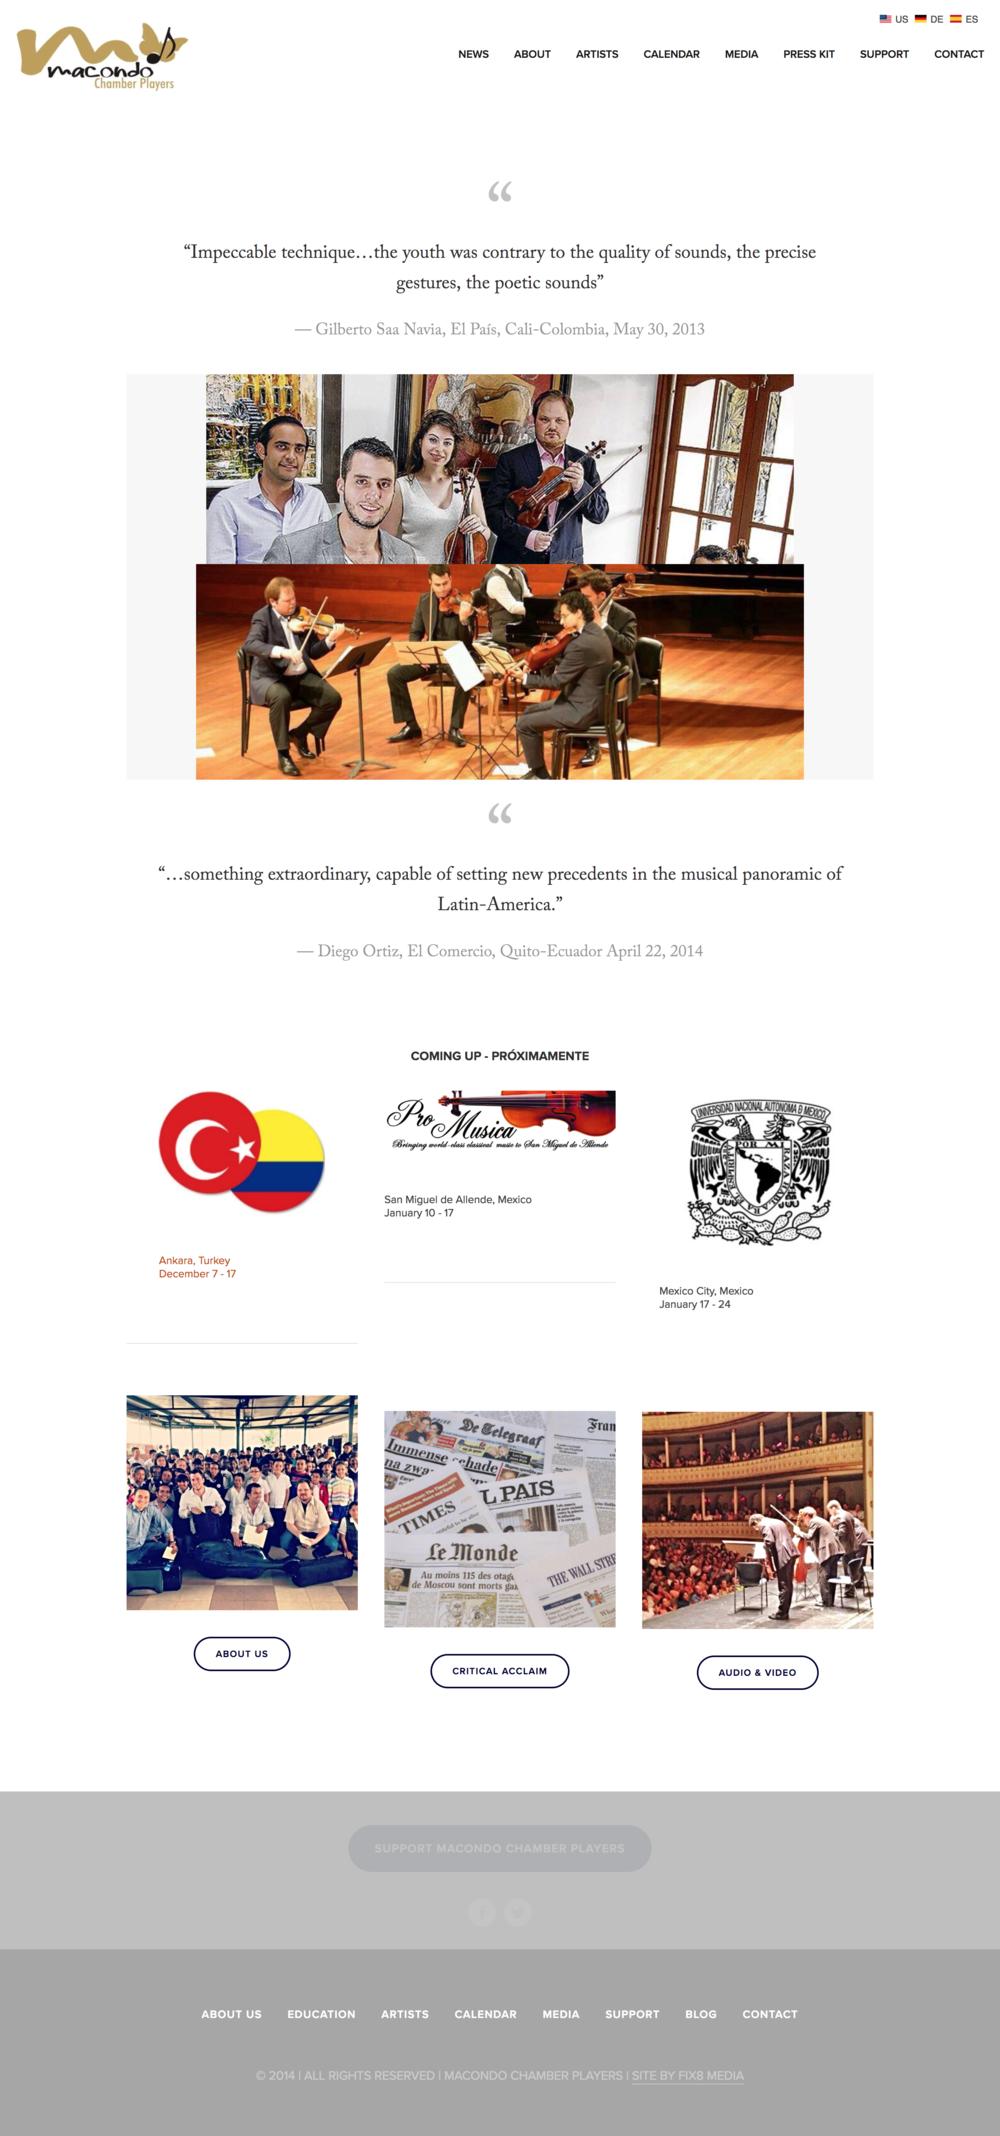 Macondo Chamber Players Musician Website